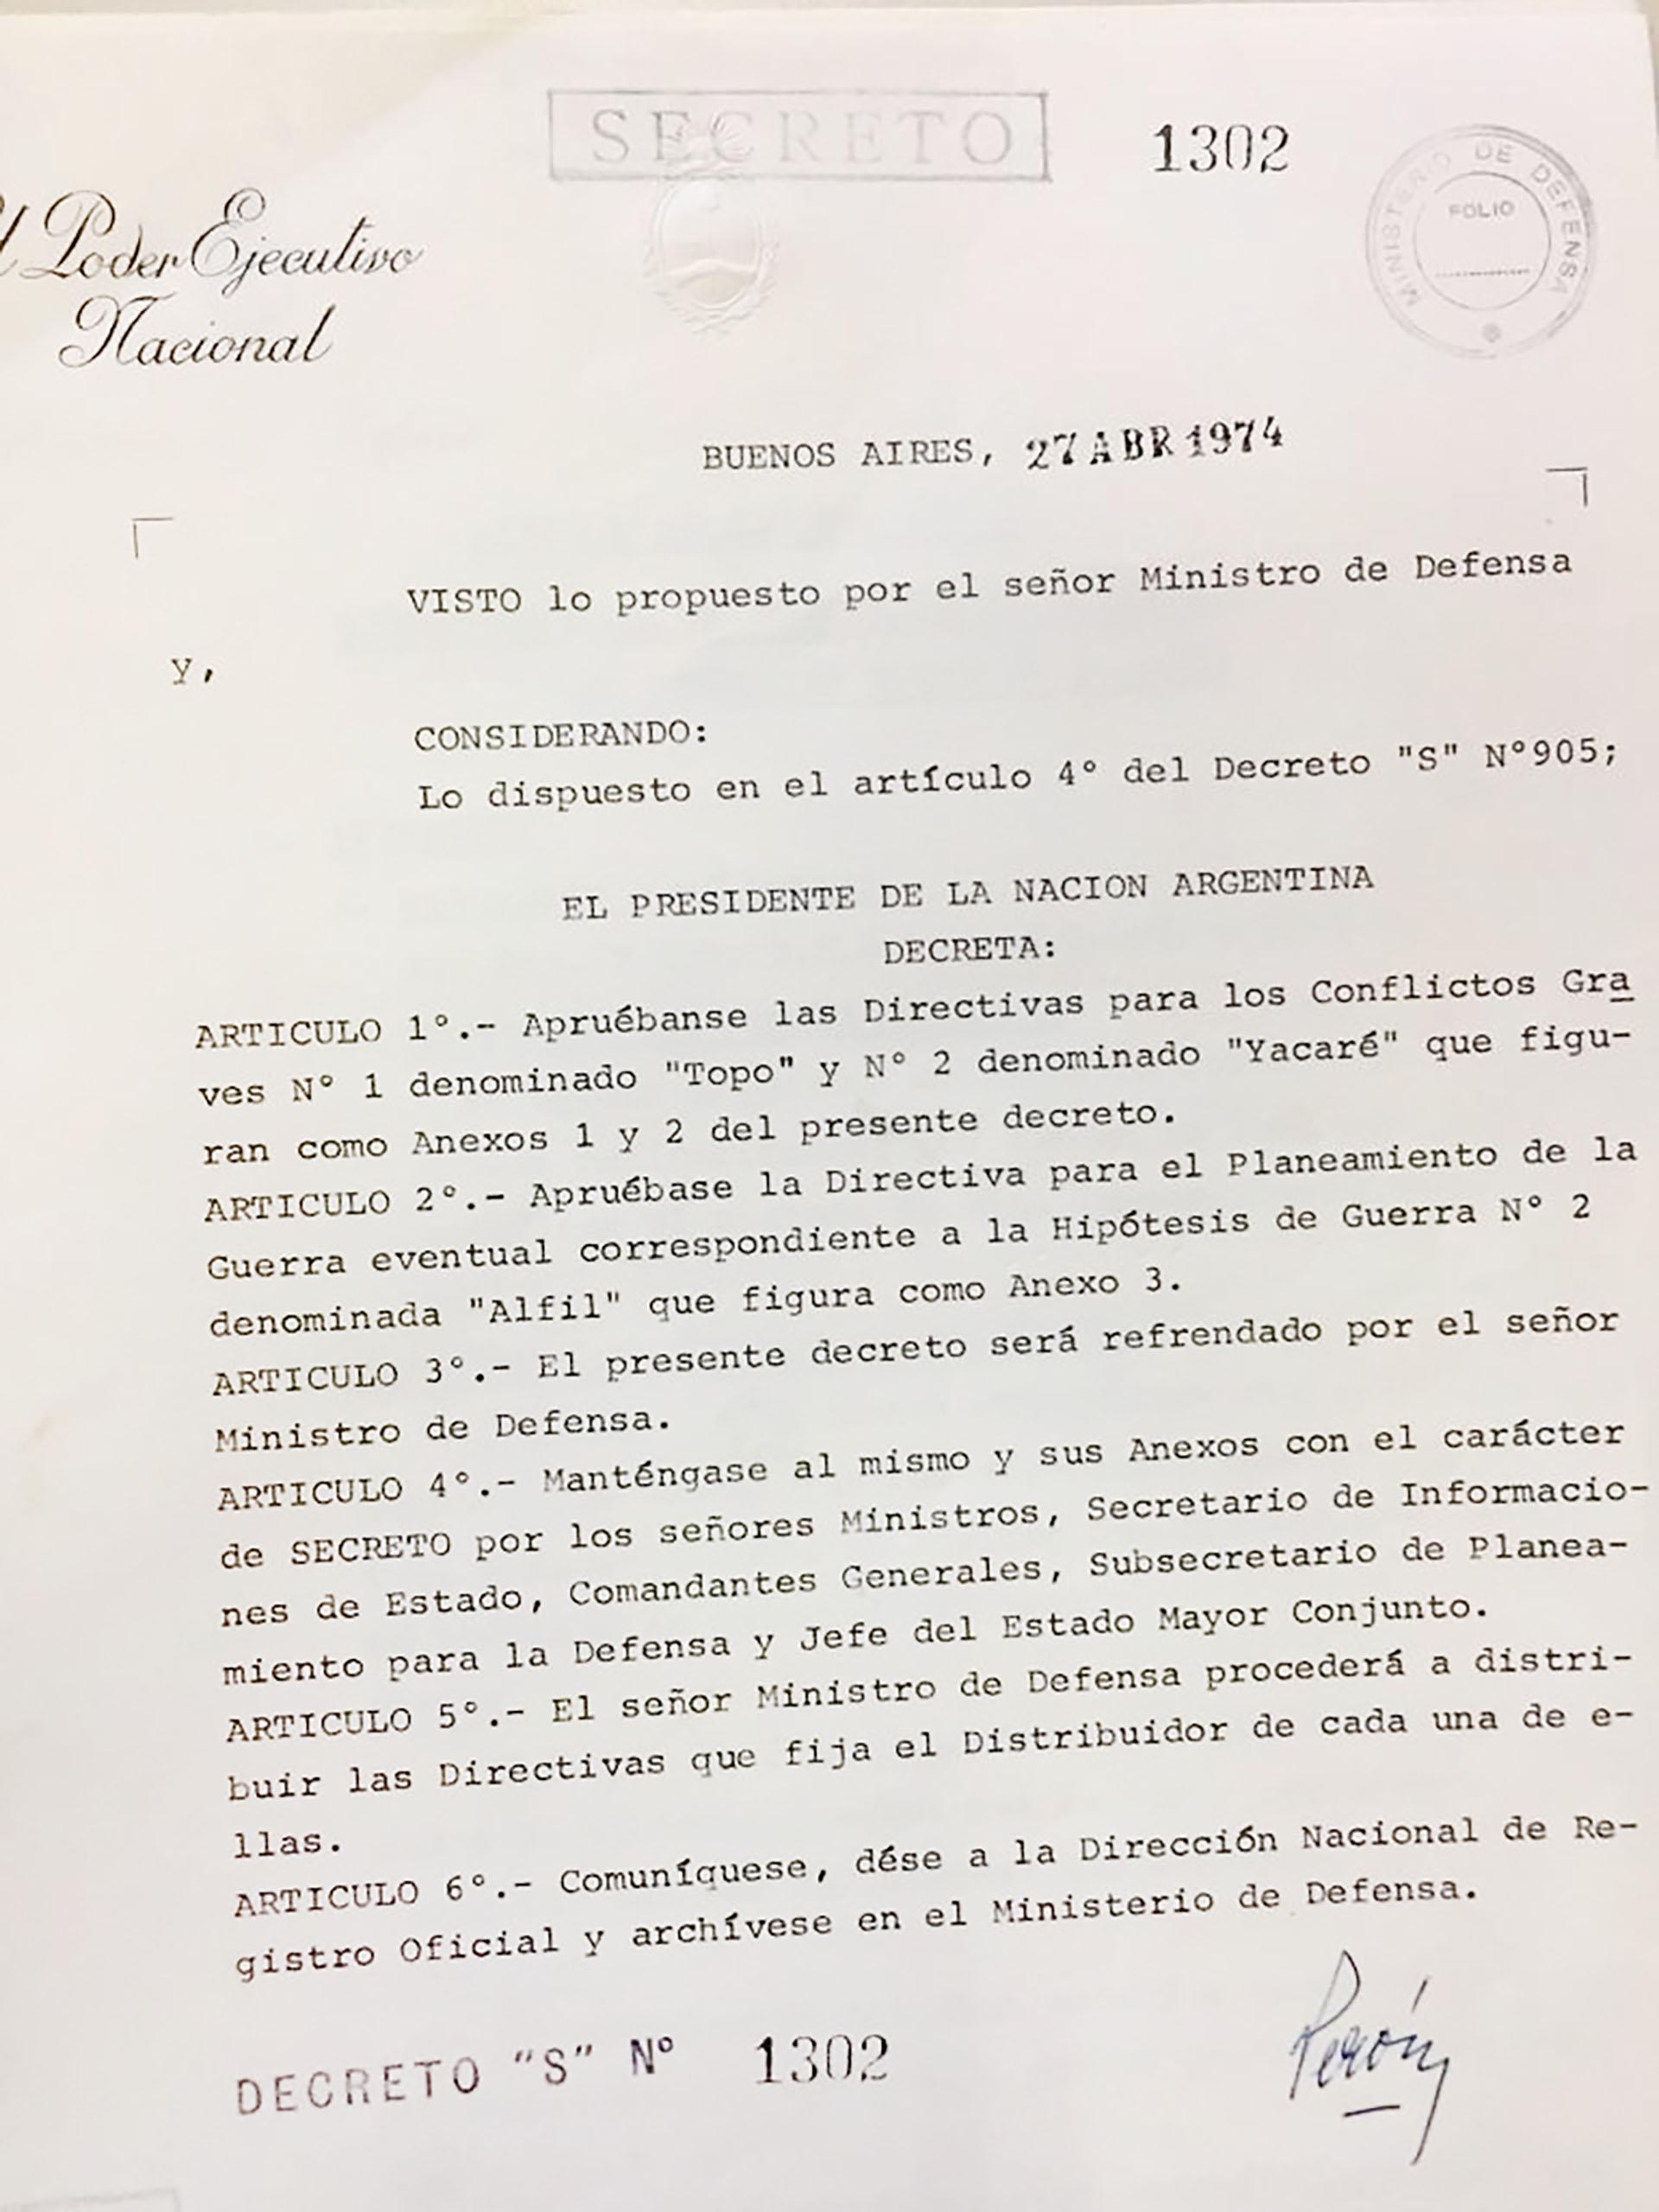 Nota Decretos Cóndor II Decreto Peron 1302_1